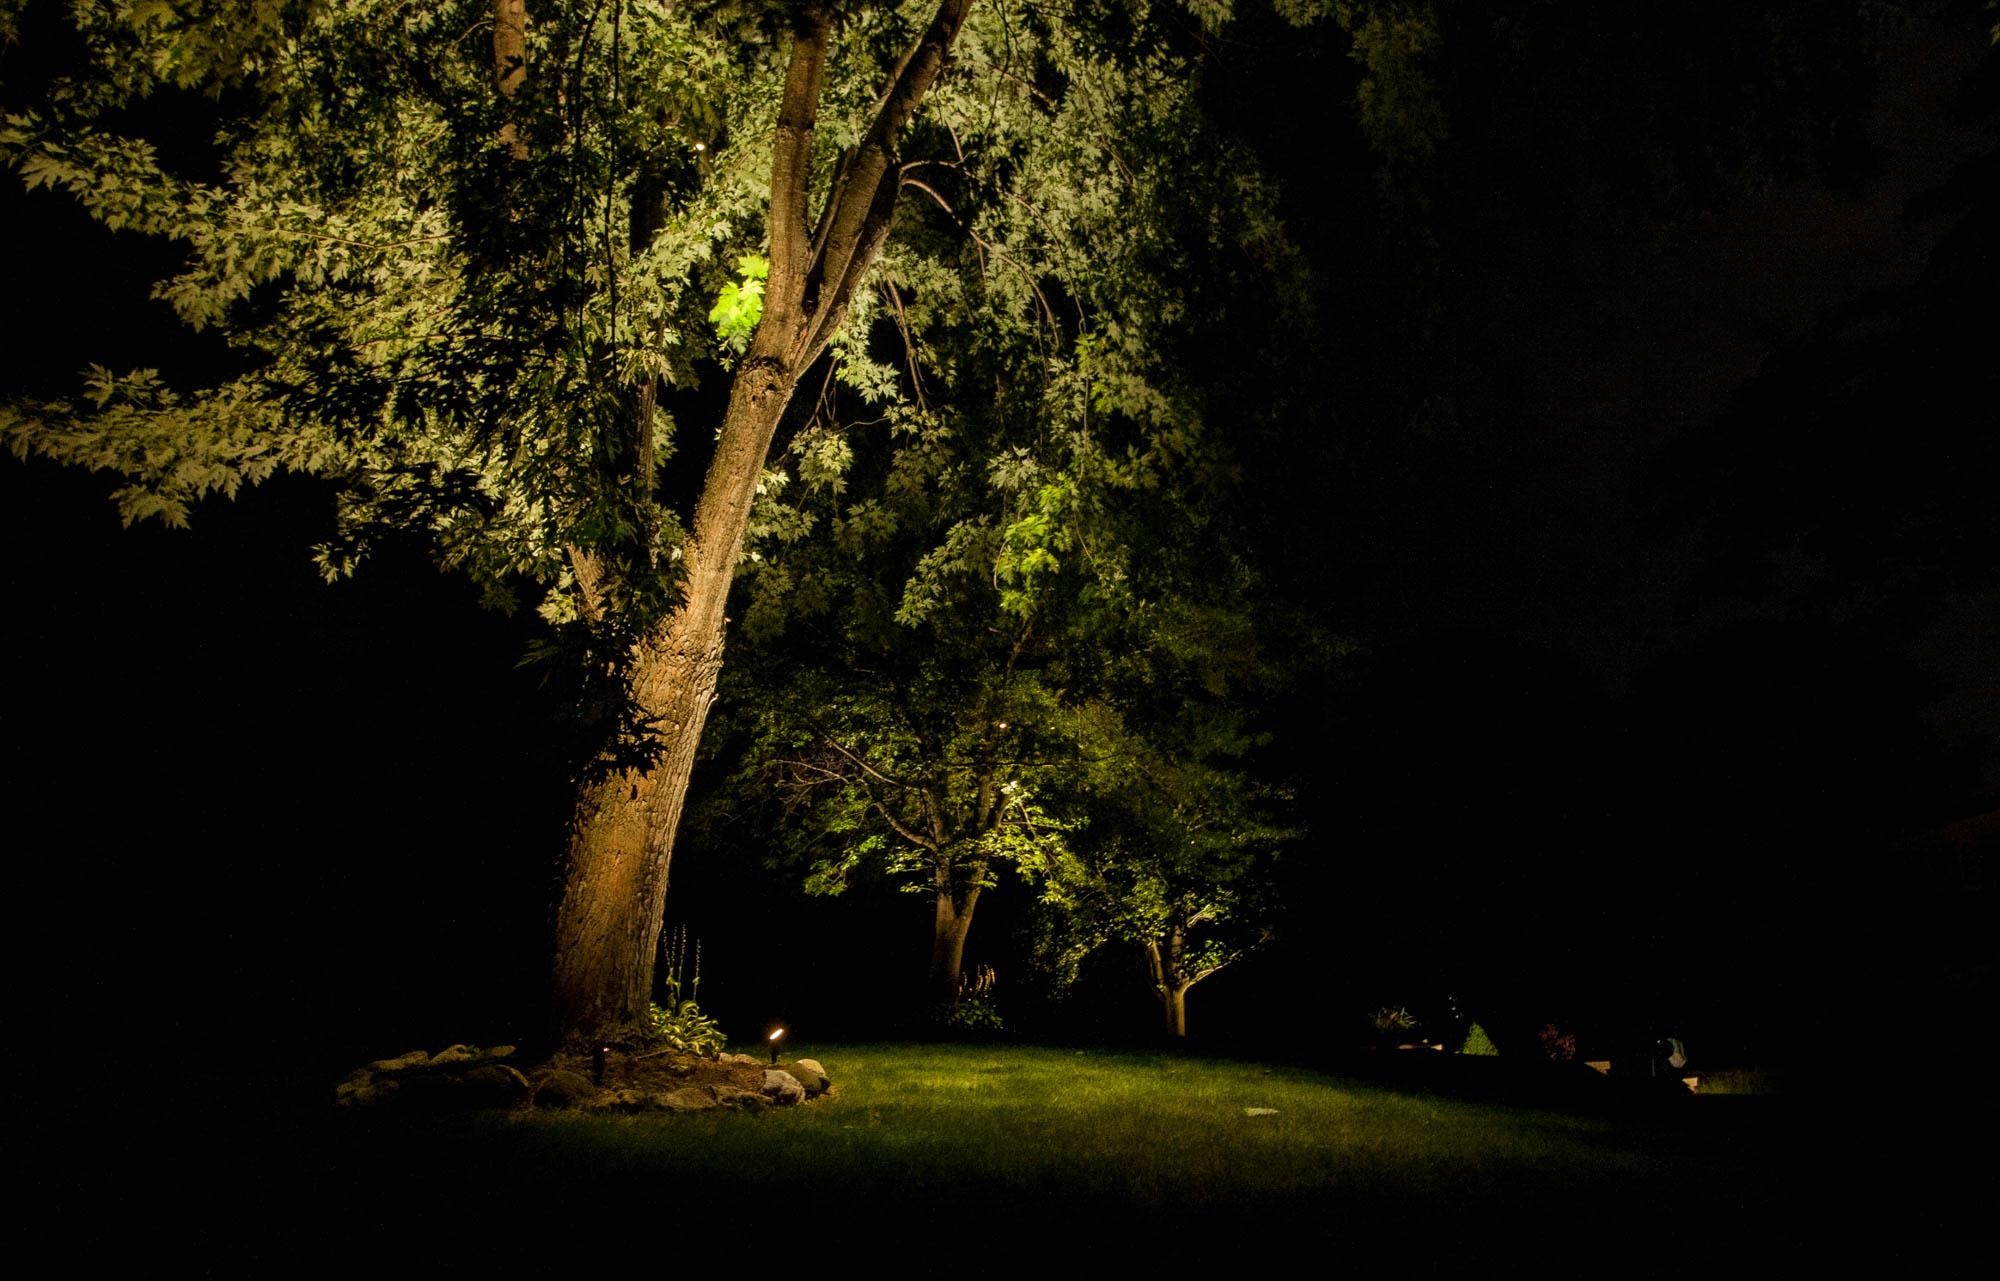 pewaukee landscape outdoor lighting night owl specimen mature trees